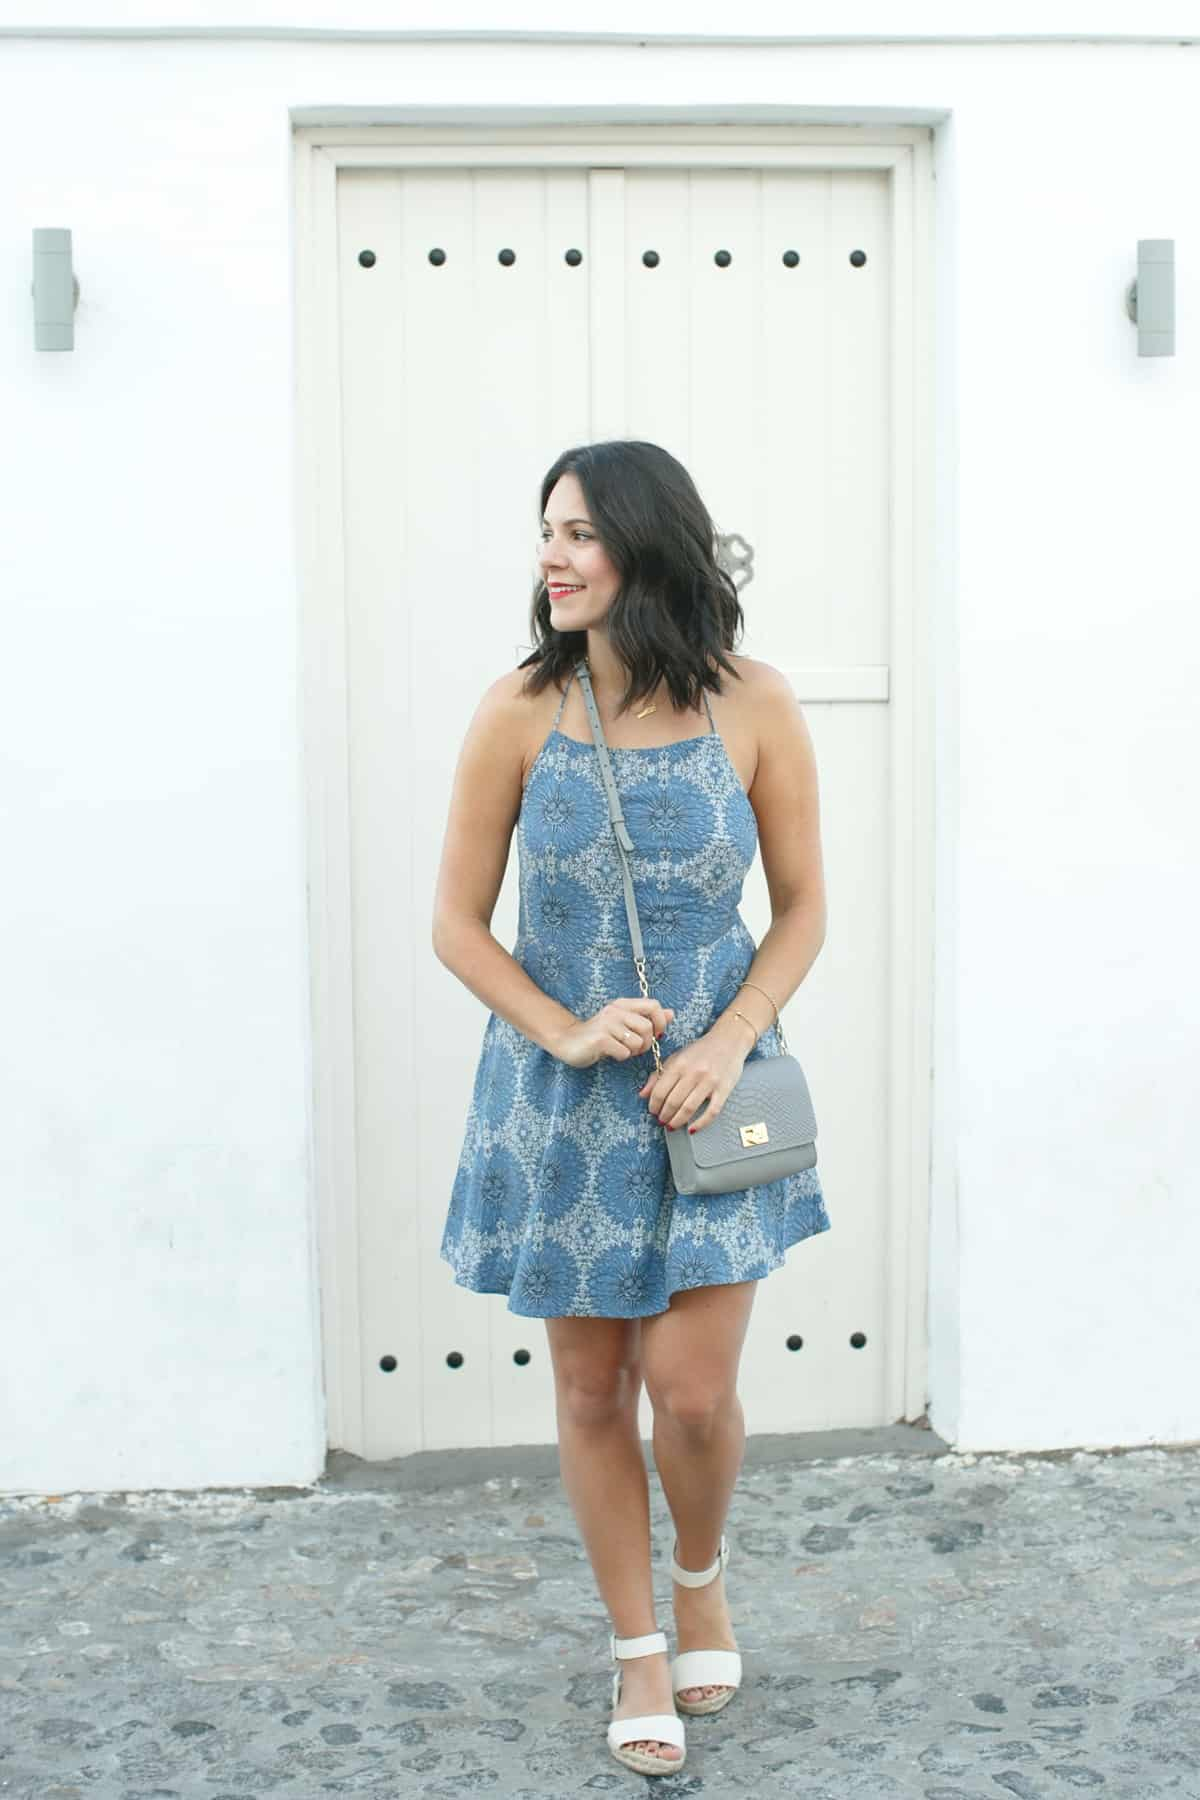 revolve blue dress, santorini outfit ideas, greece outfit ideas - My Style Vita @mystylevita